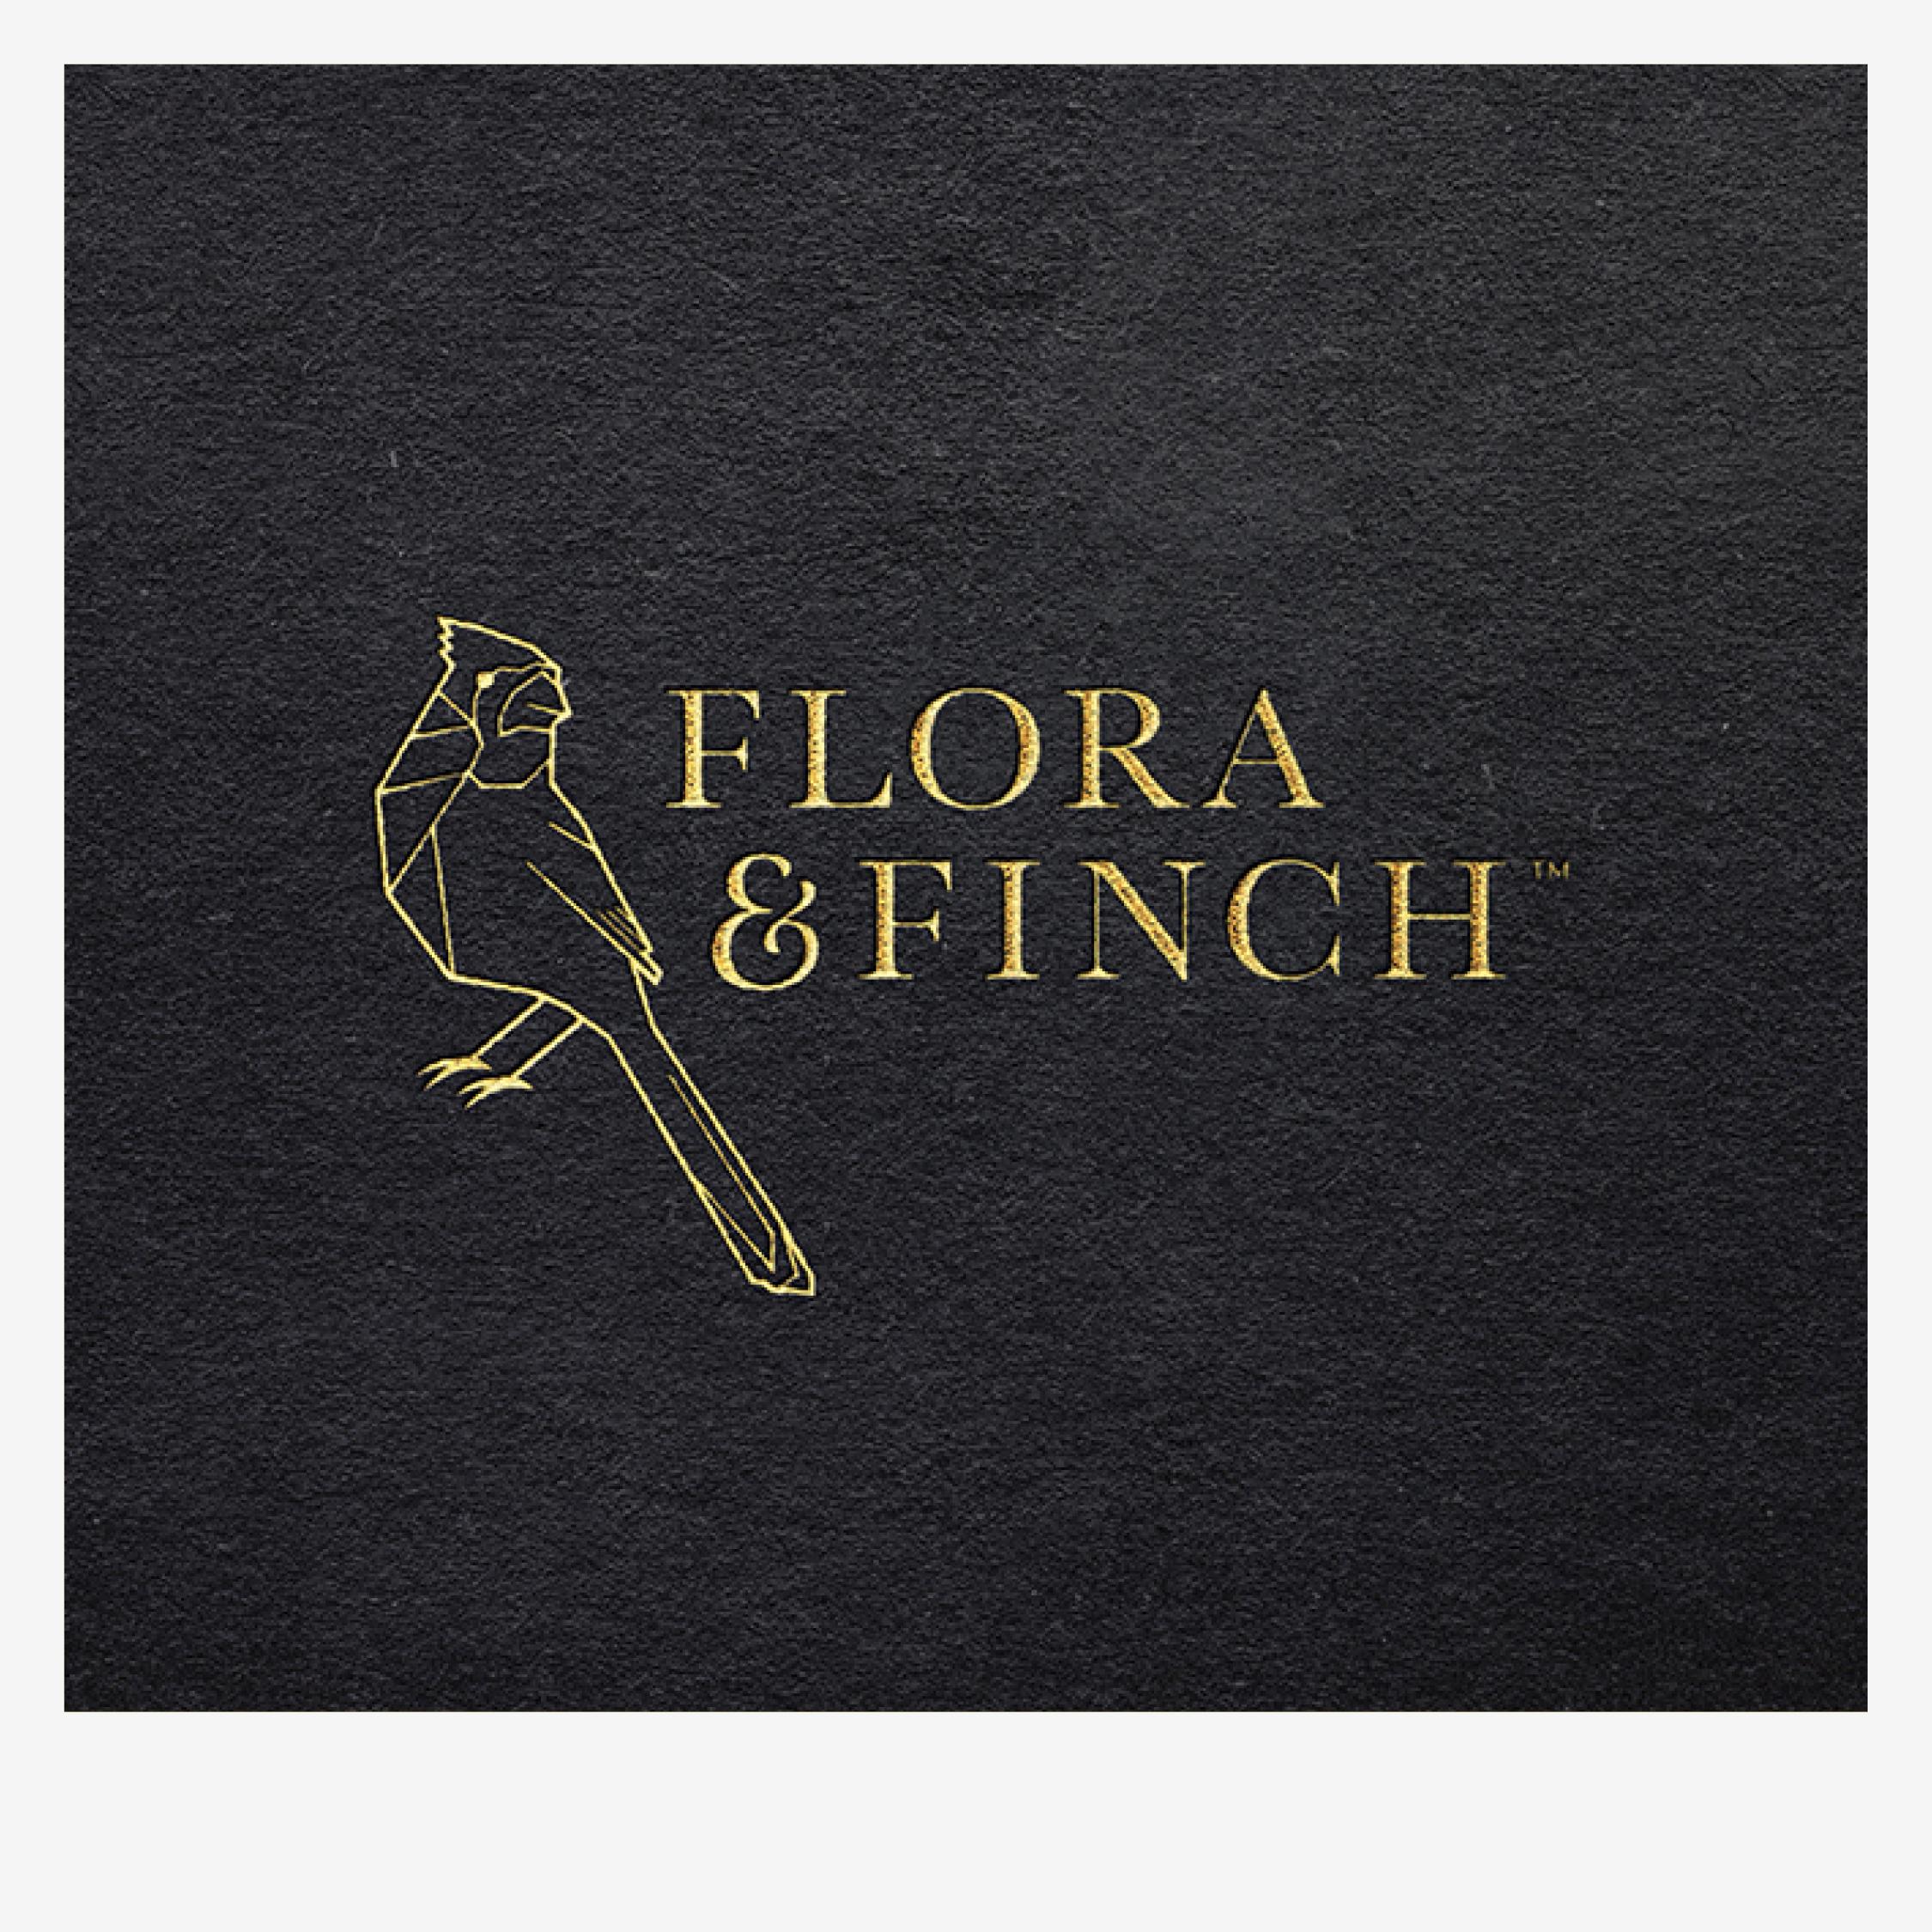 Flora & Finch's logo